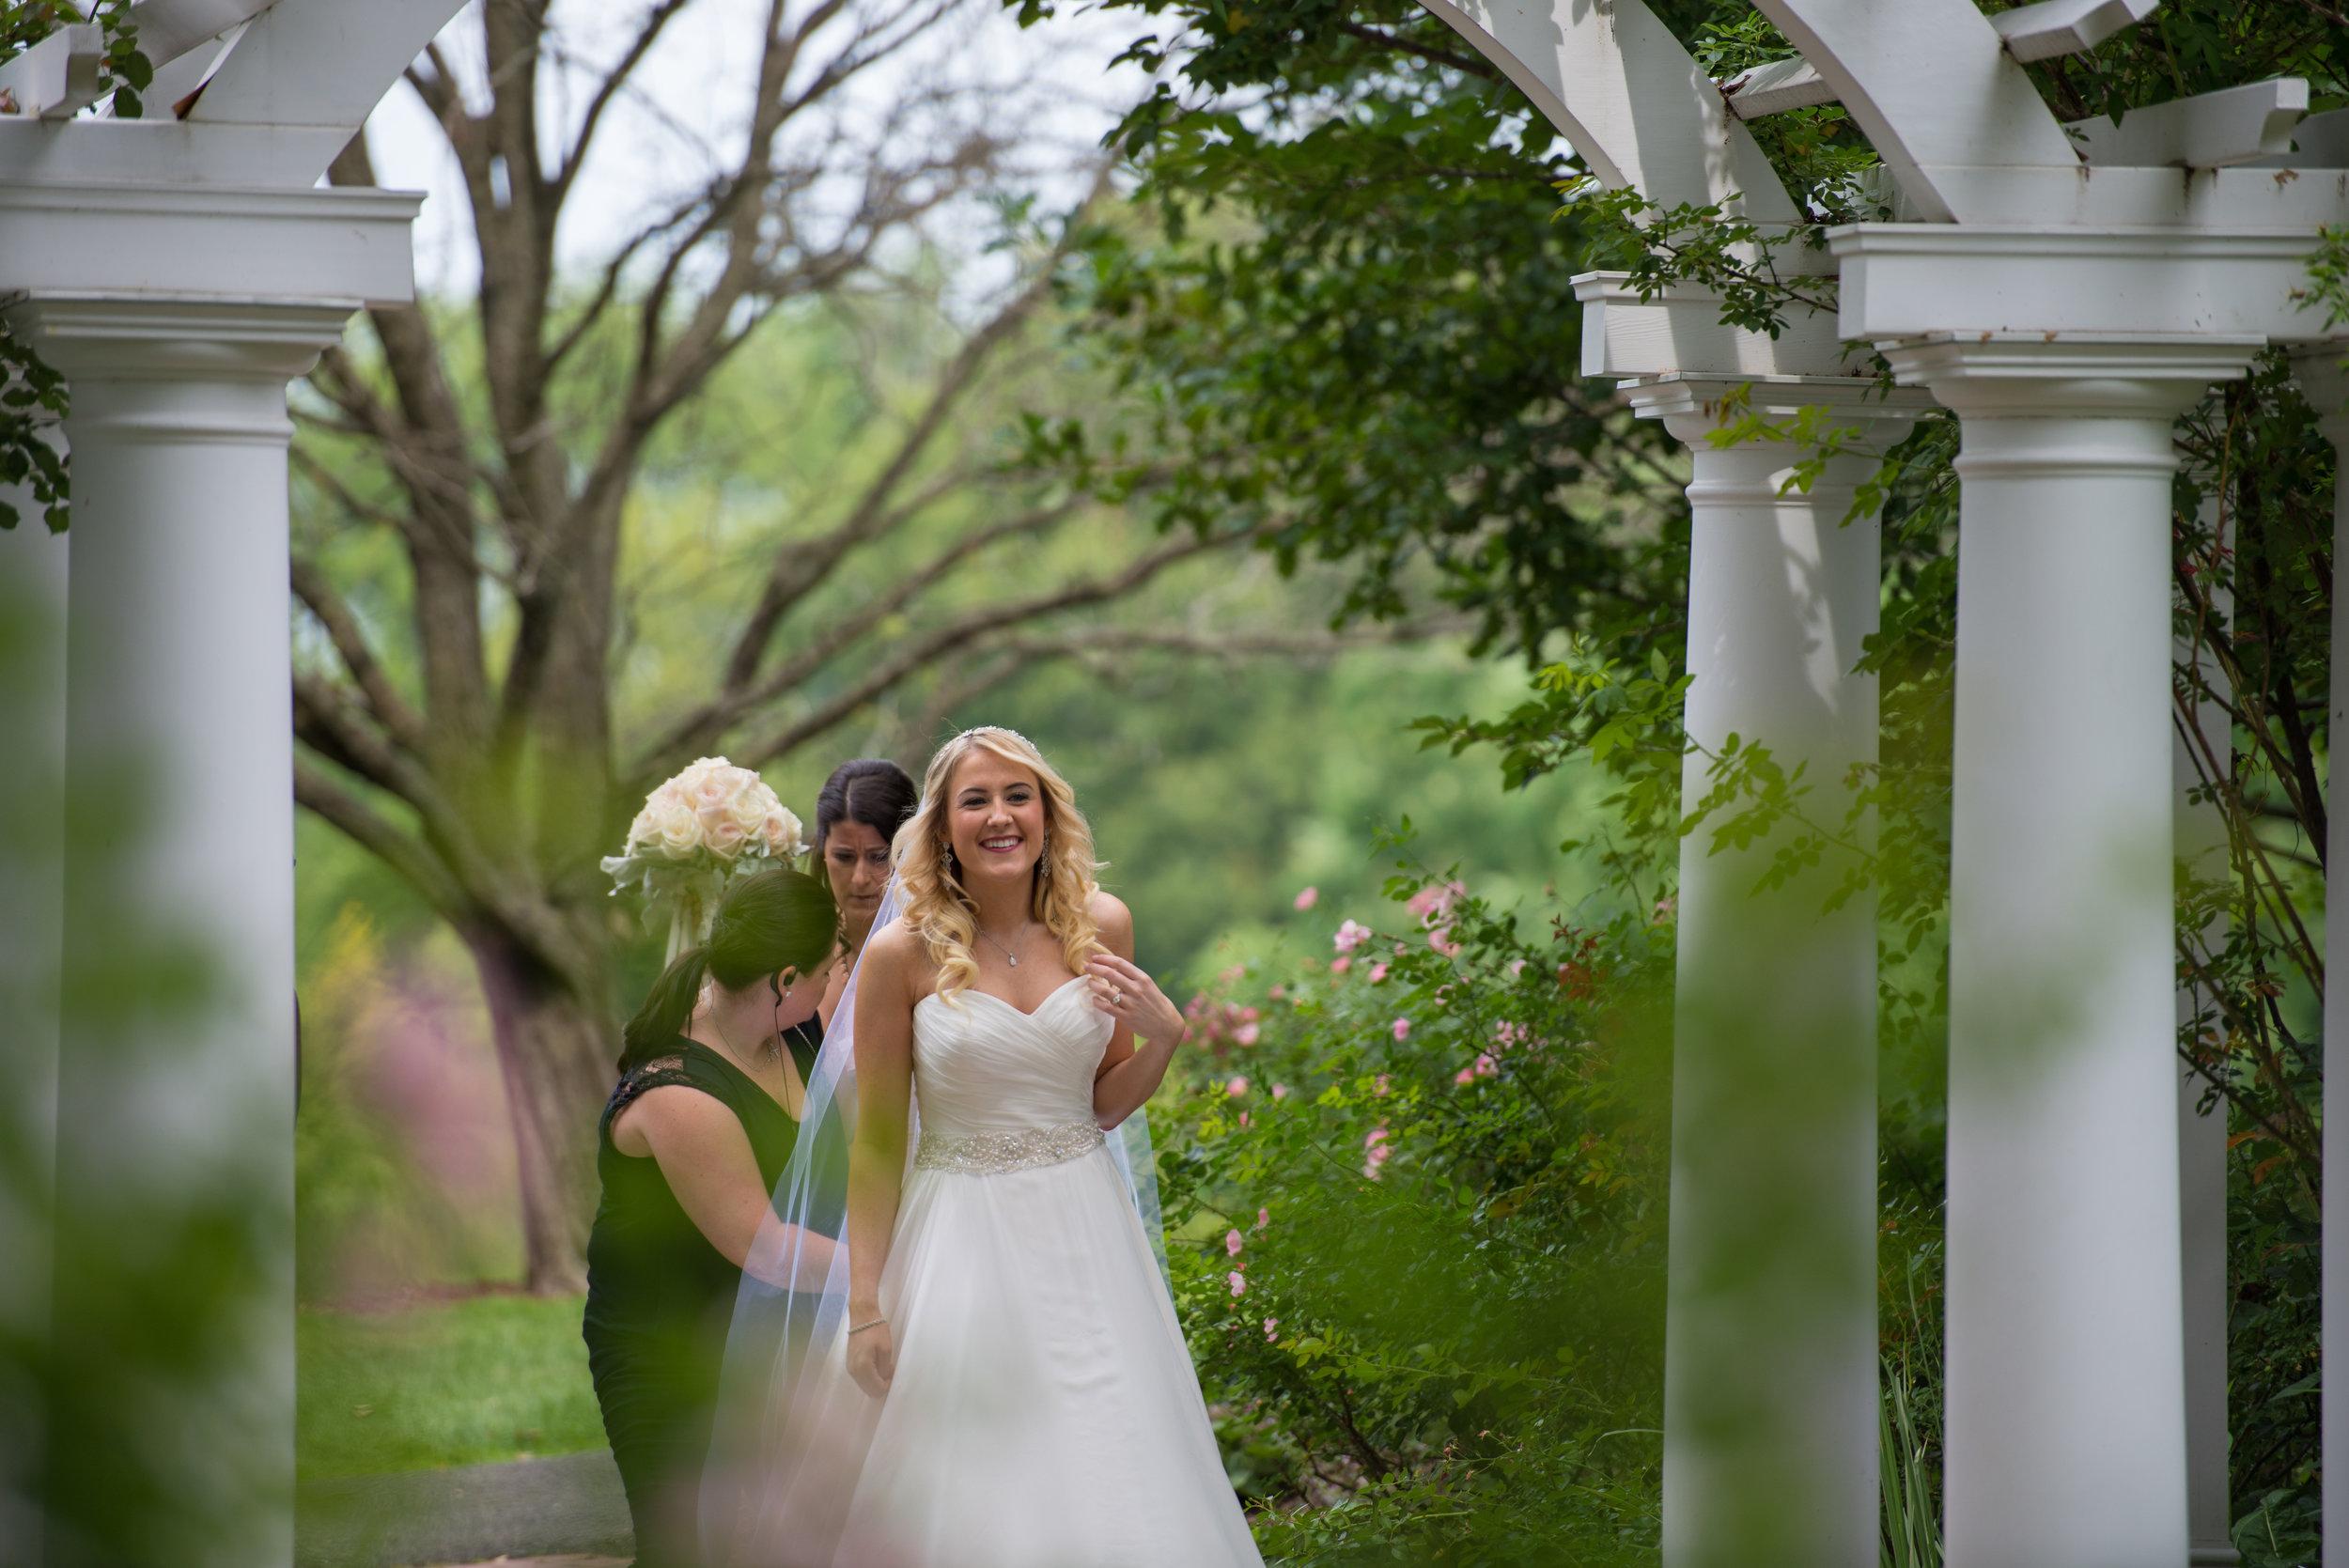 Wedding First Look Photos00909.jpg